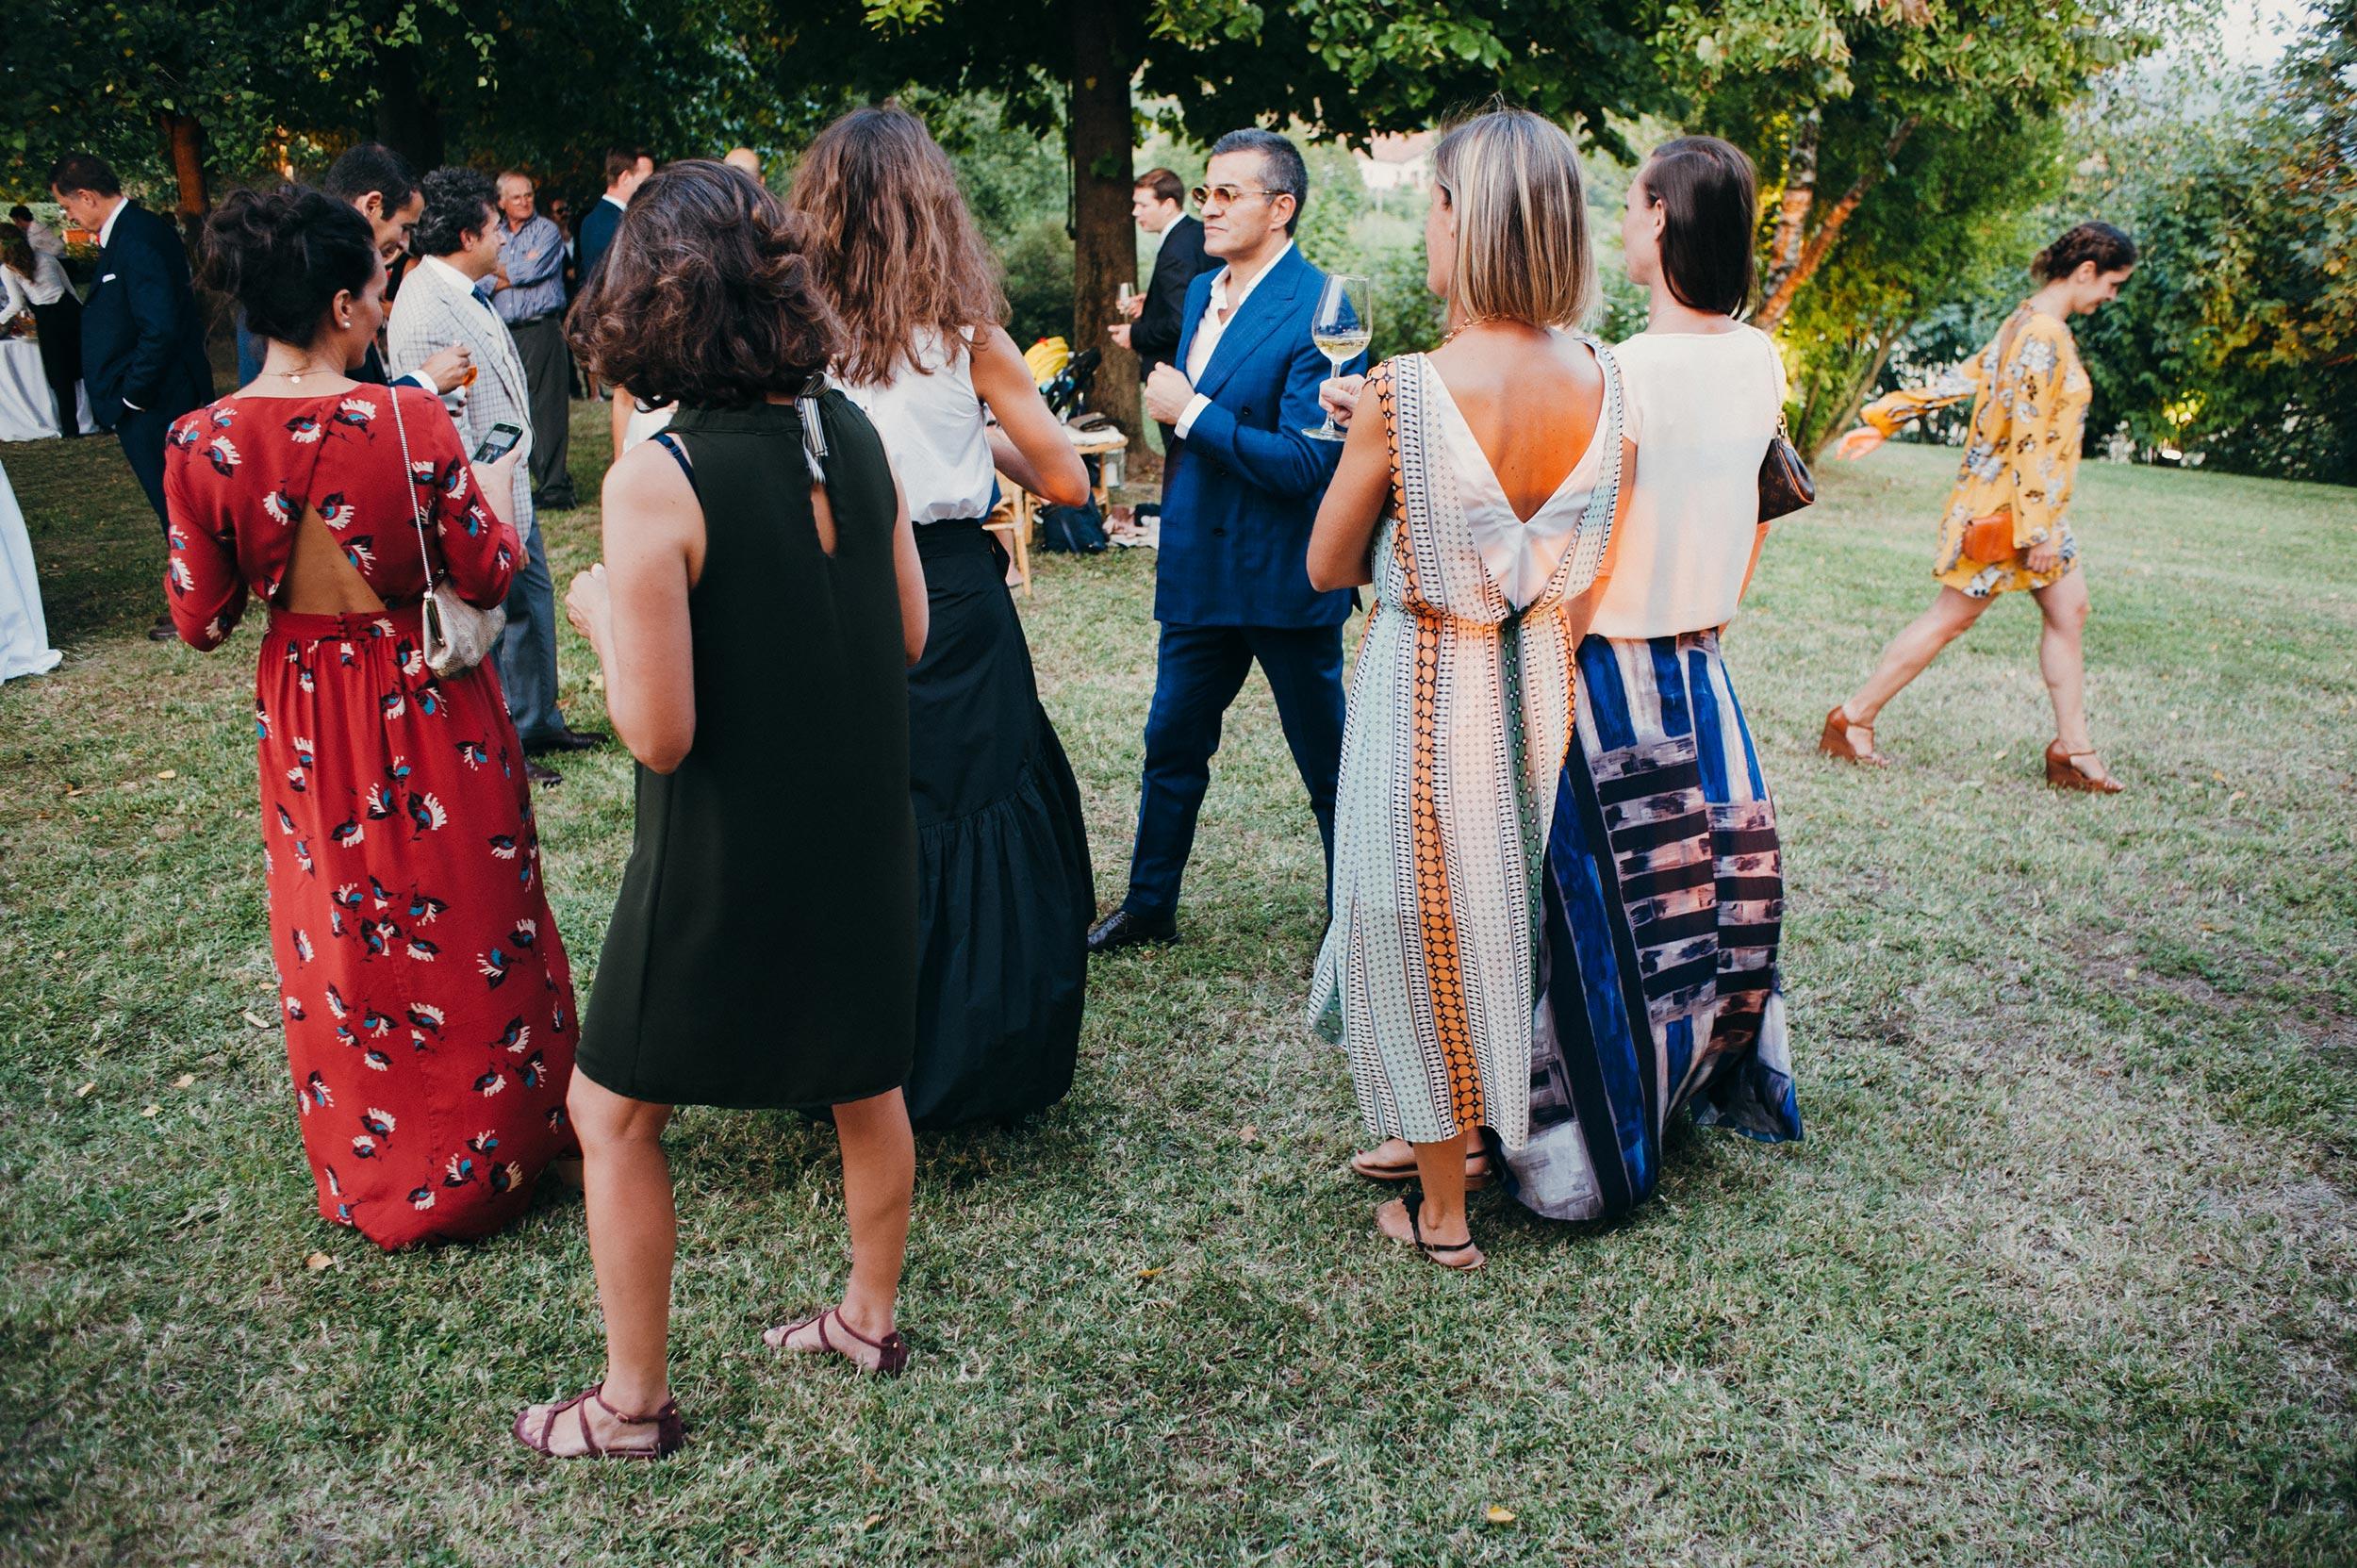 2016-Davor-Chiara-Monferrato-Asti-Vercelli-Wedding-Photographer-Italy-Alessandro-Avenali-62.jpg